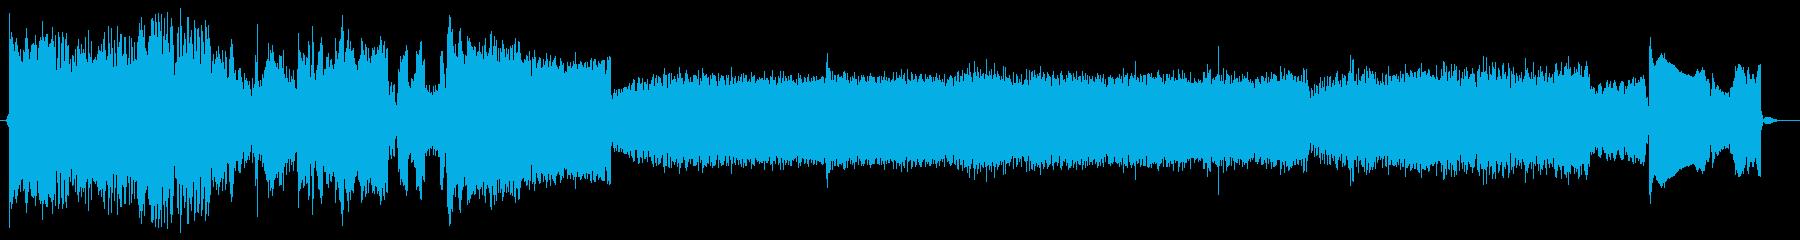 2WO WAY COMの再生済みの波形